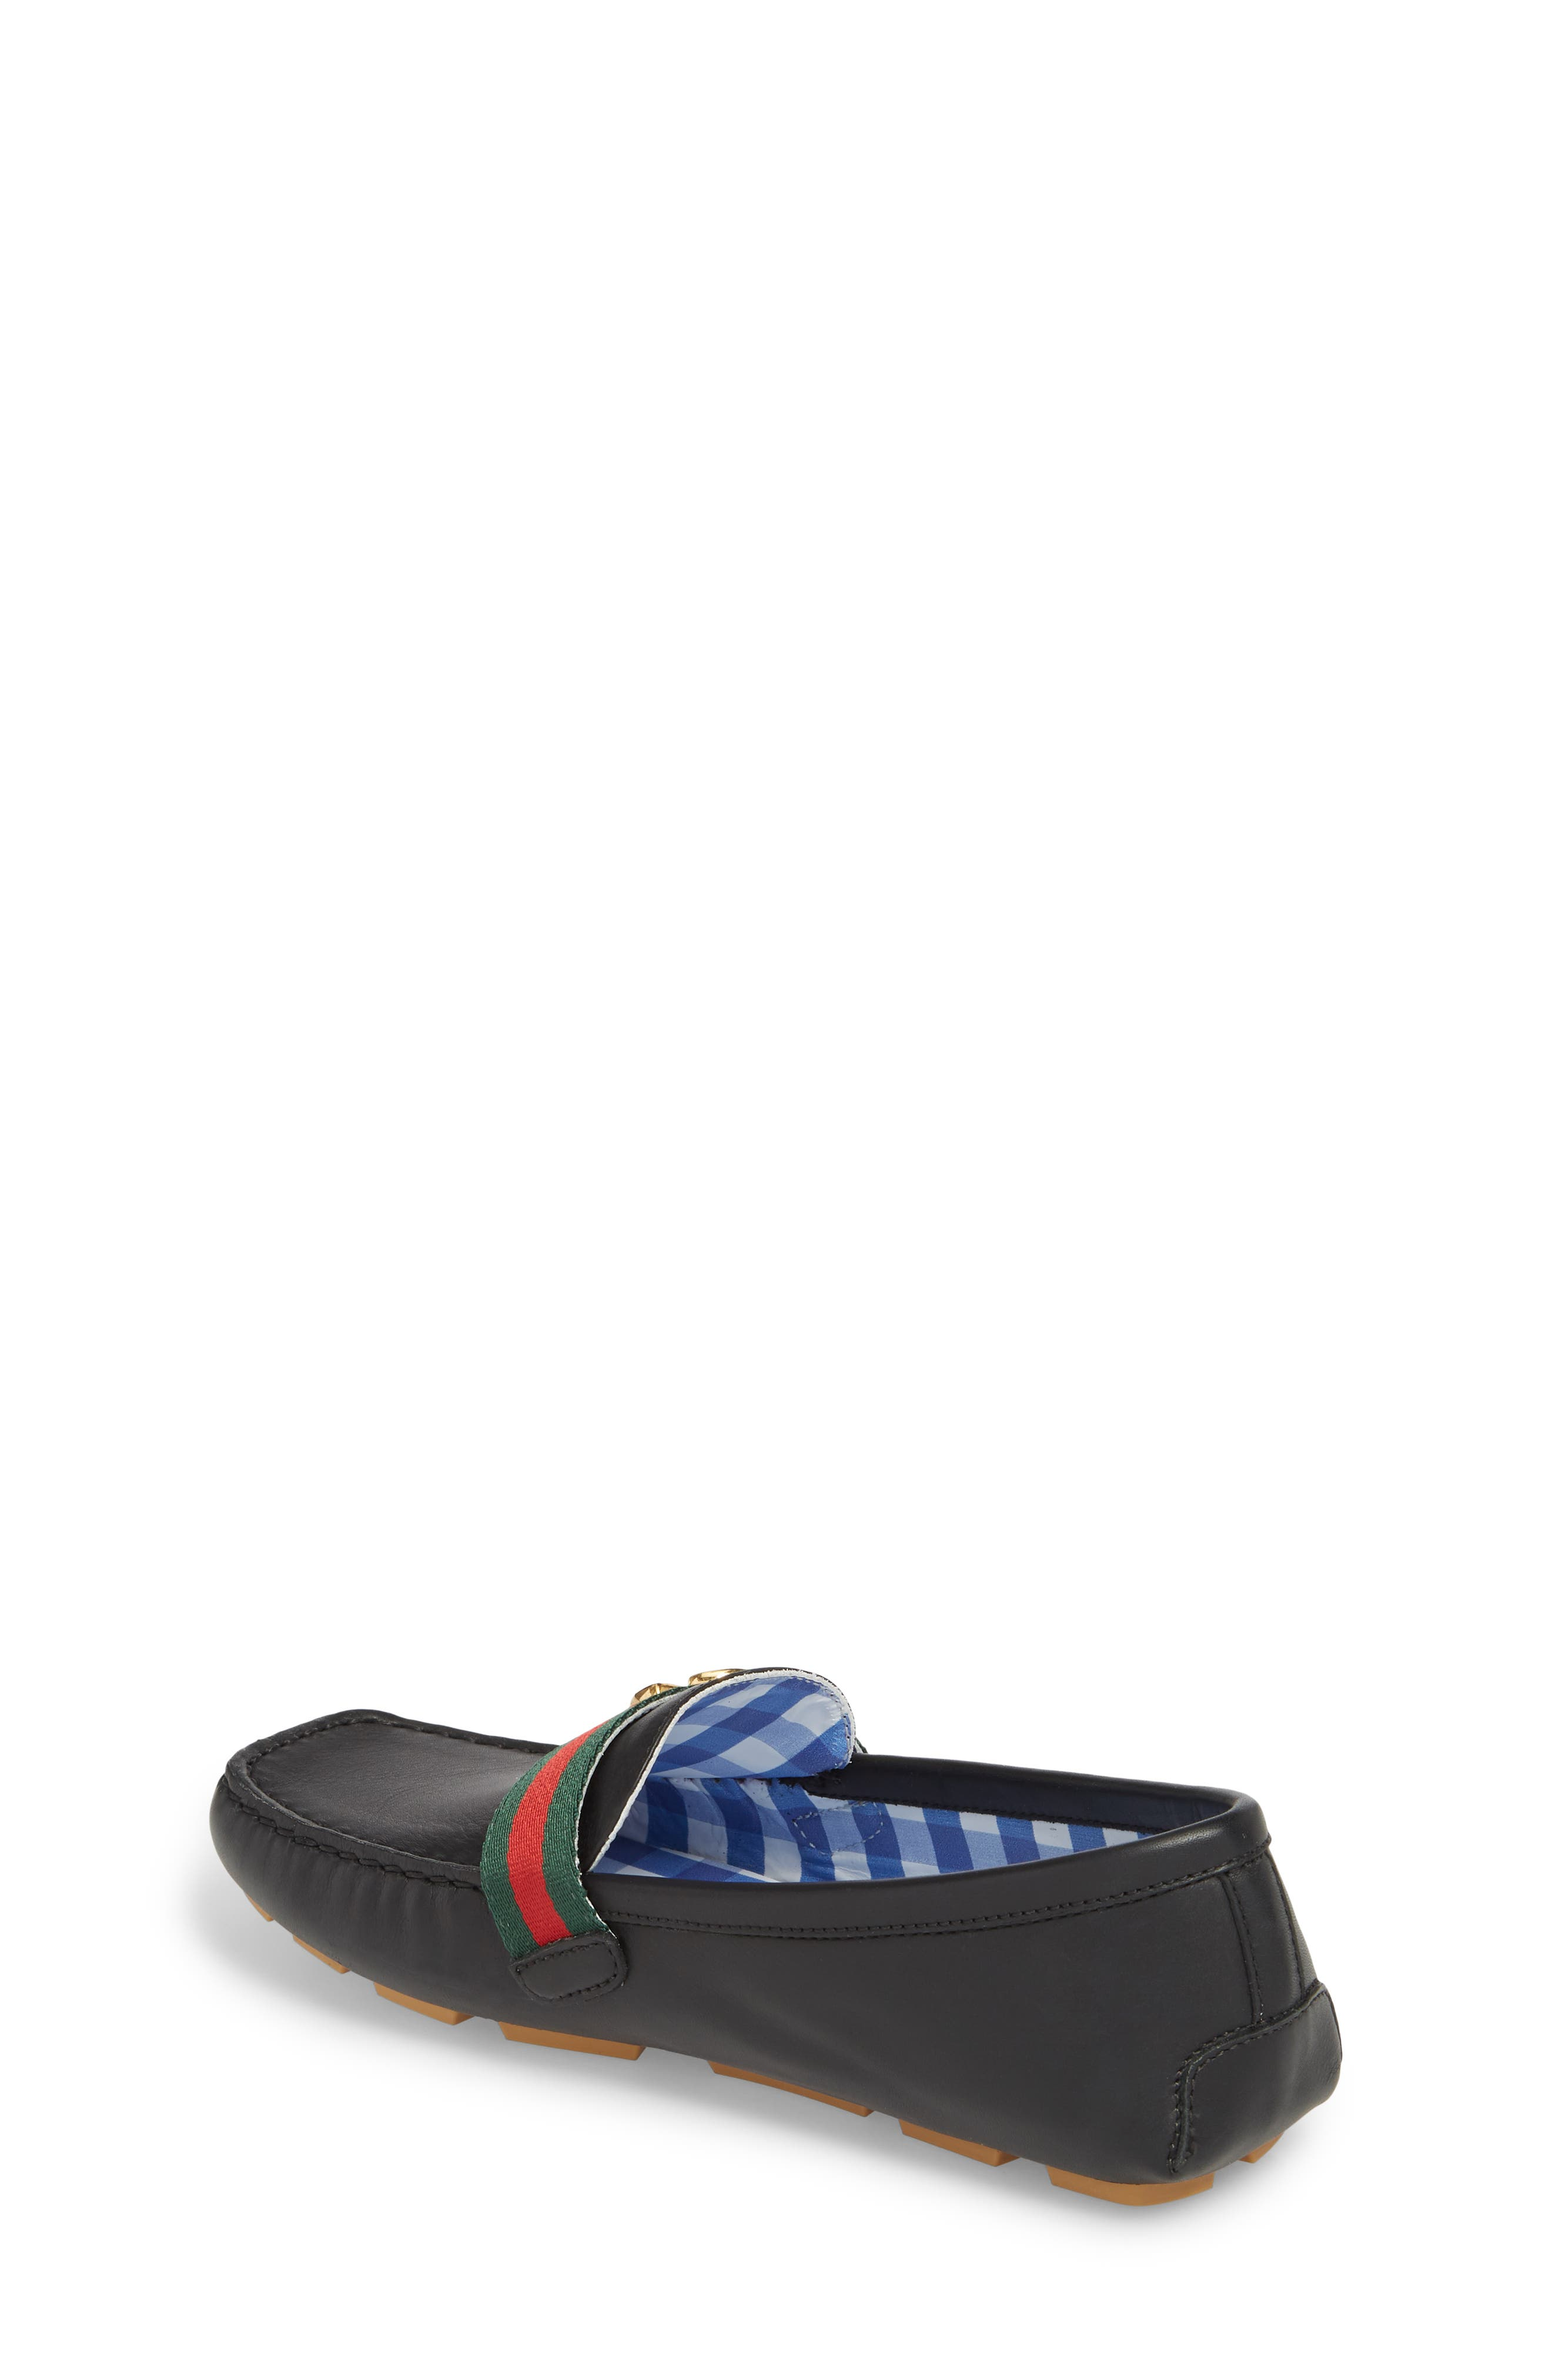 GUCCI, Noel Driving Loafer, Alternate thumbnail 2, color, BLACK